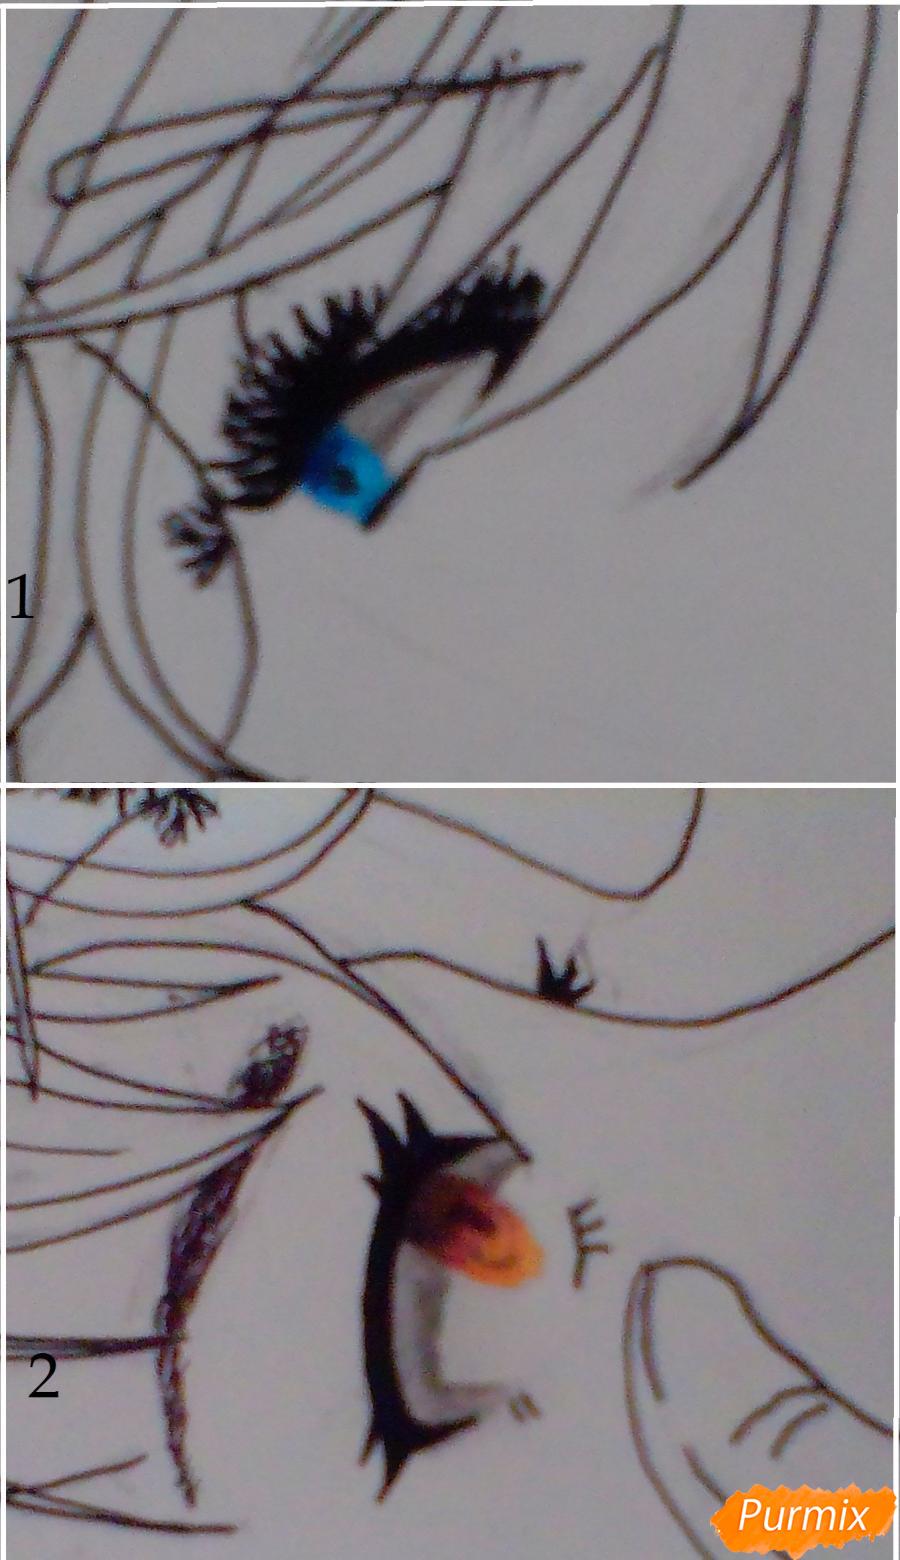 Рисуем Никифорова и Кацуки из аниме Юри на льду карандашами - шаг 5